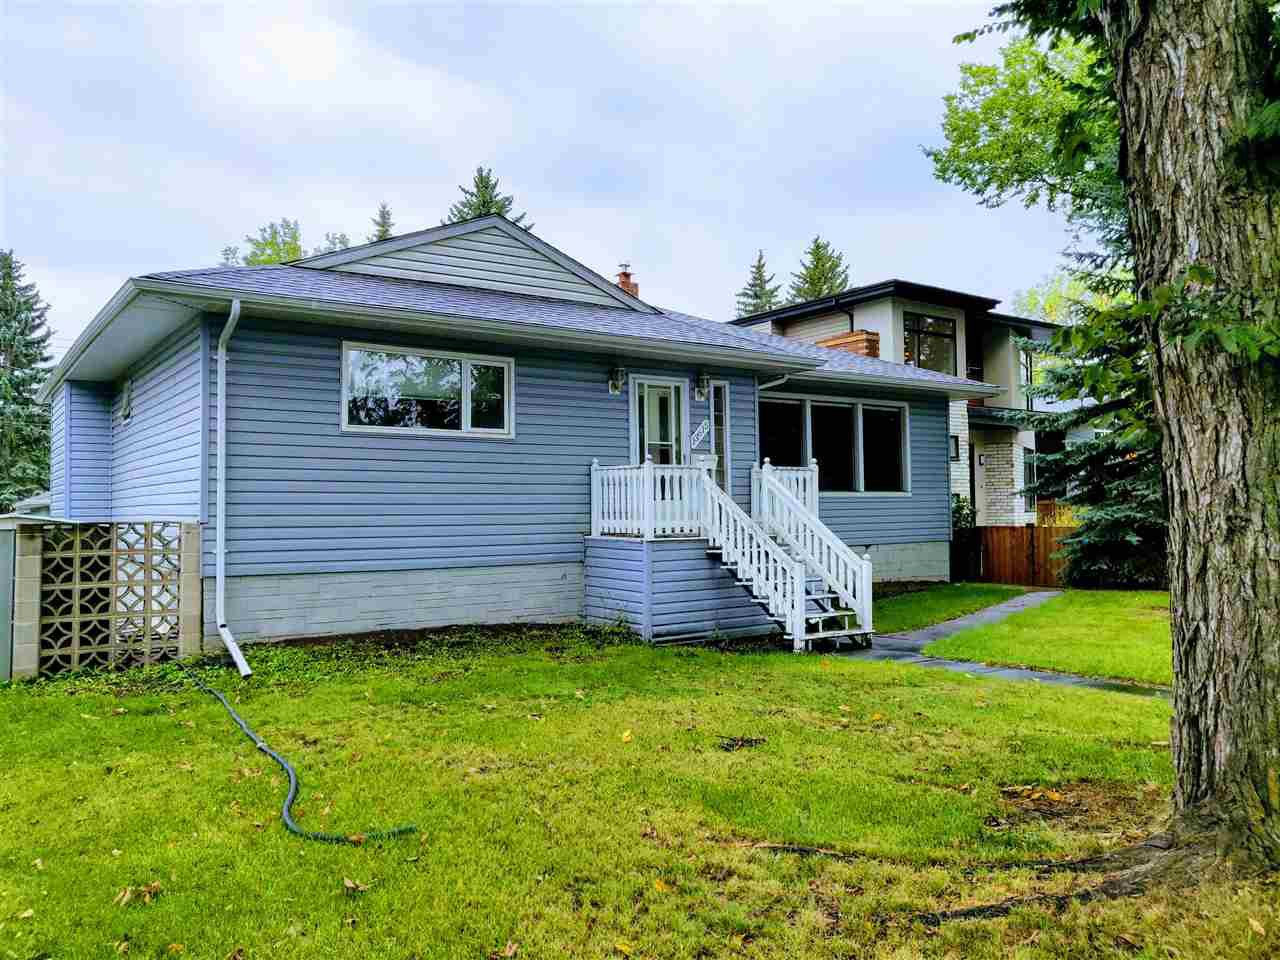 Main Photo: 13615 STONY_PLAIN Road in Edmonton: Zone 11 House for sale : MLS®# E4171977